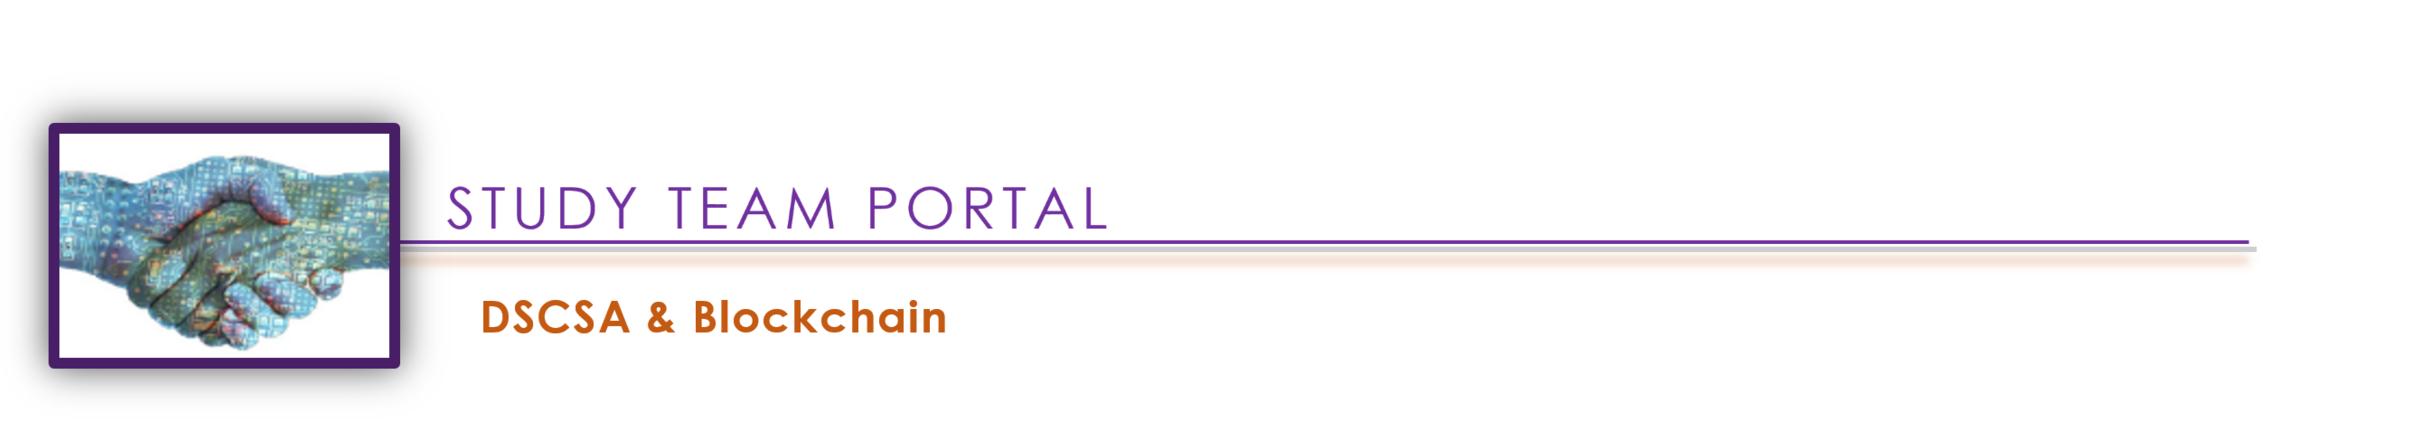 Blockchain 1 - portal banner.PNG